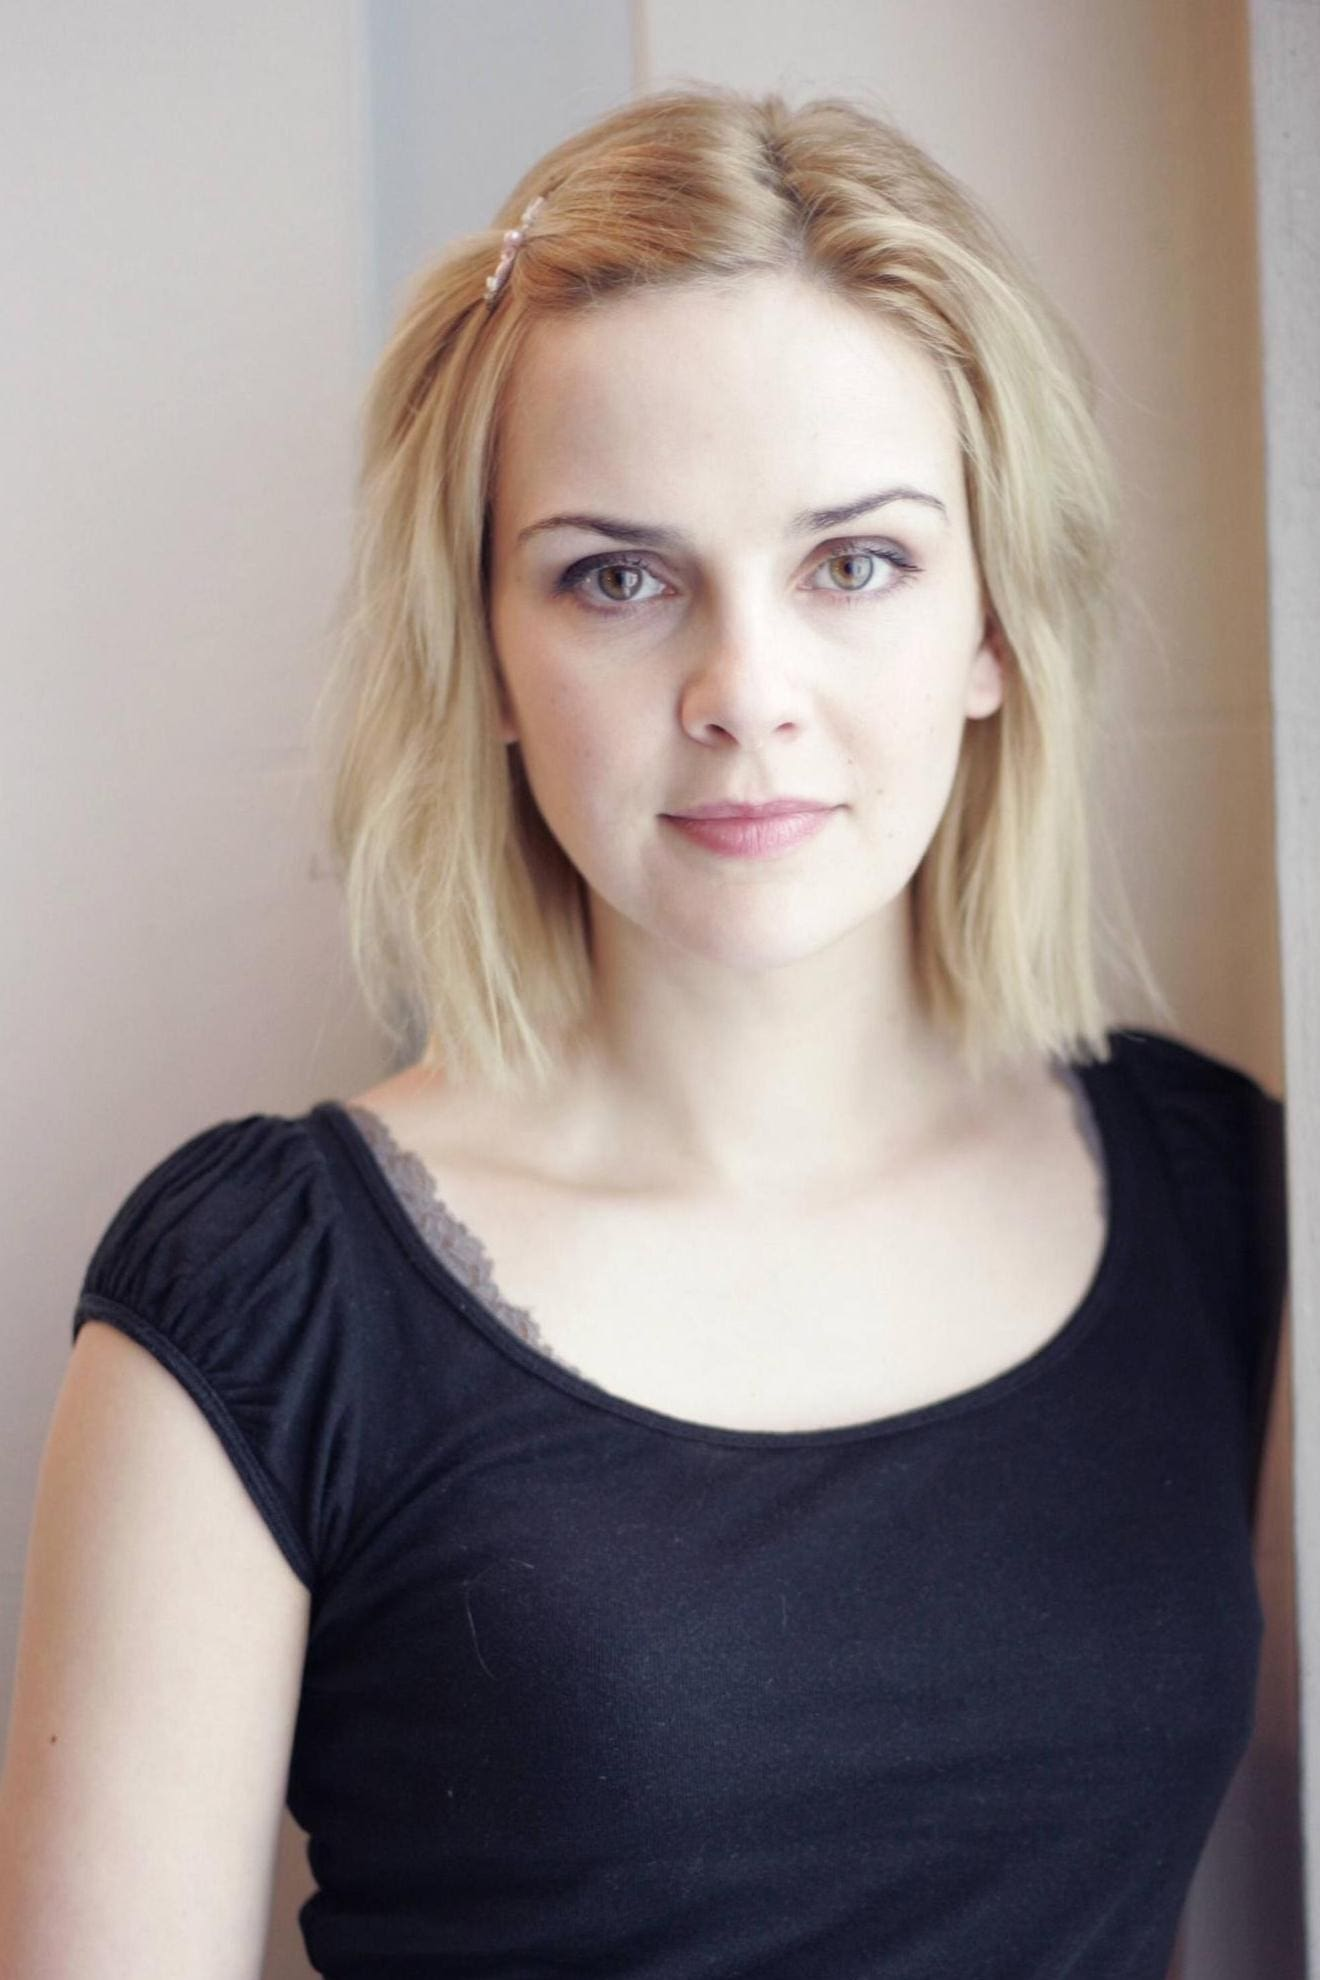 Denise Zich - Personer - Film . nu